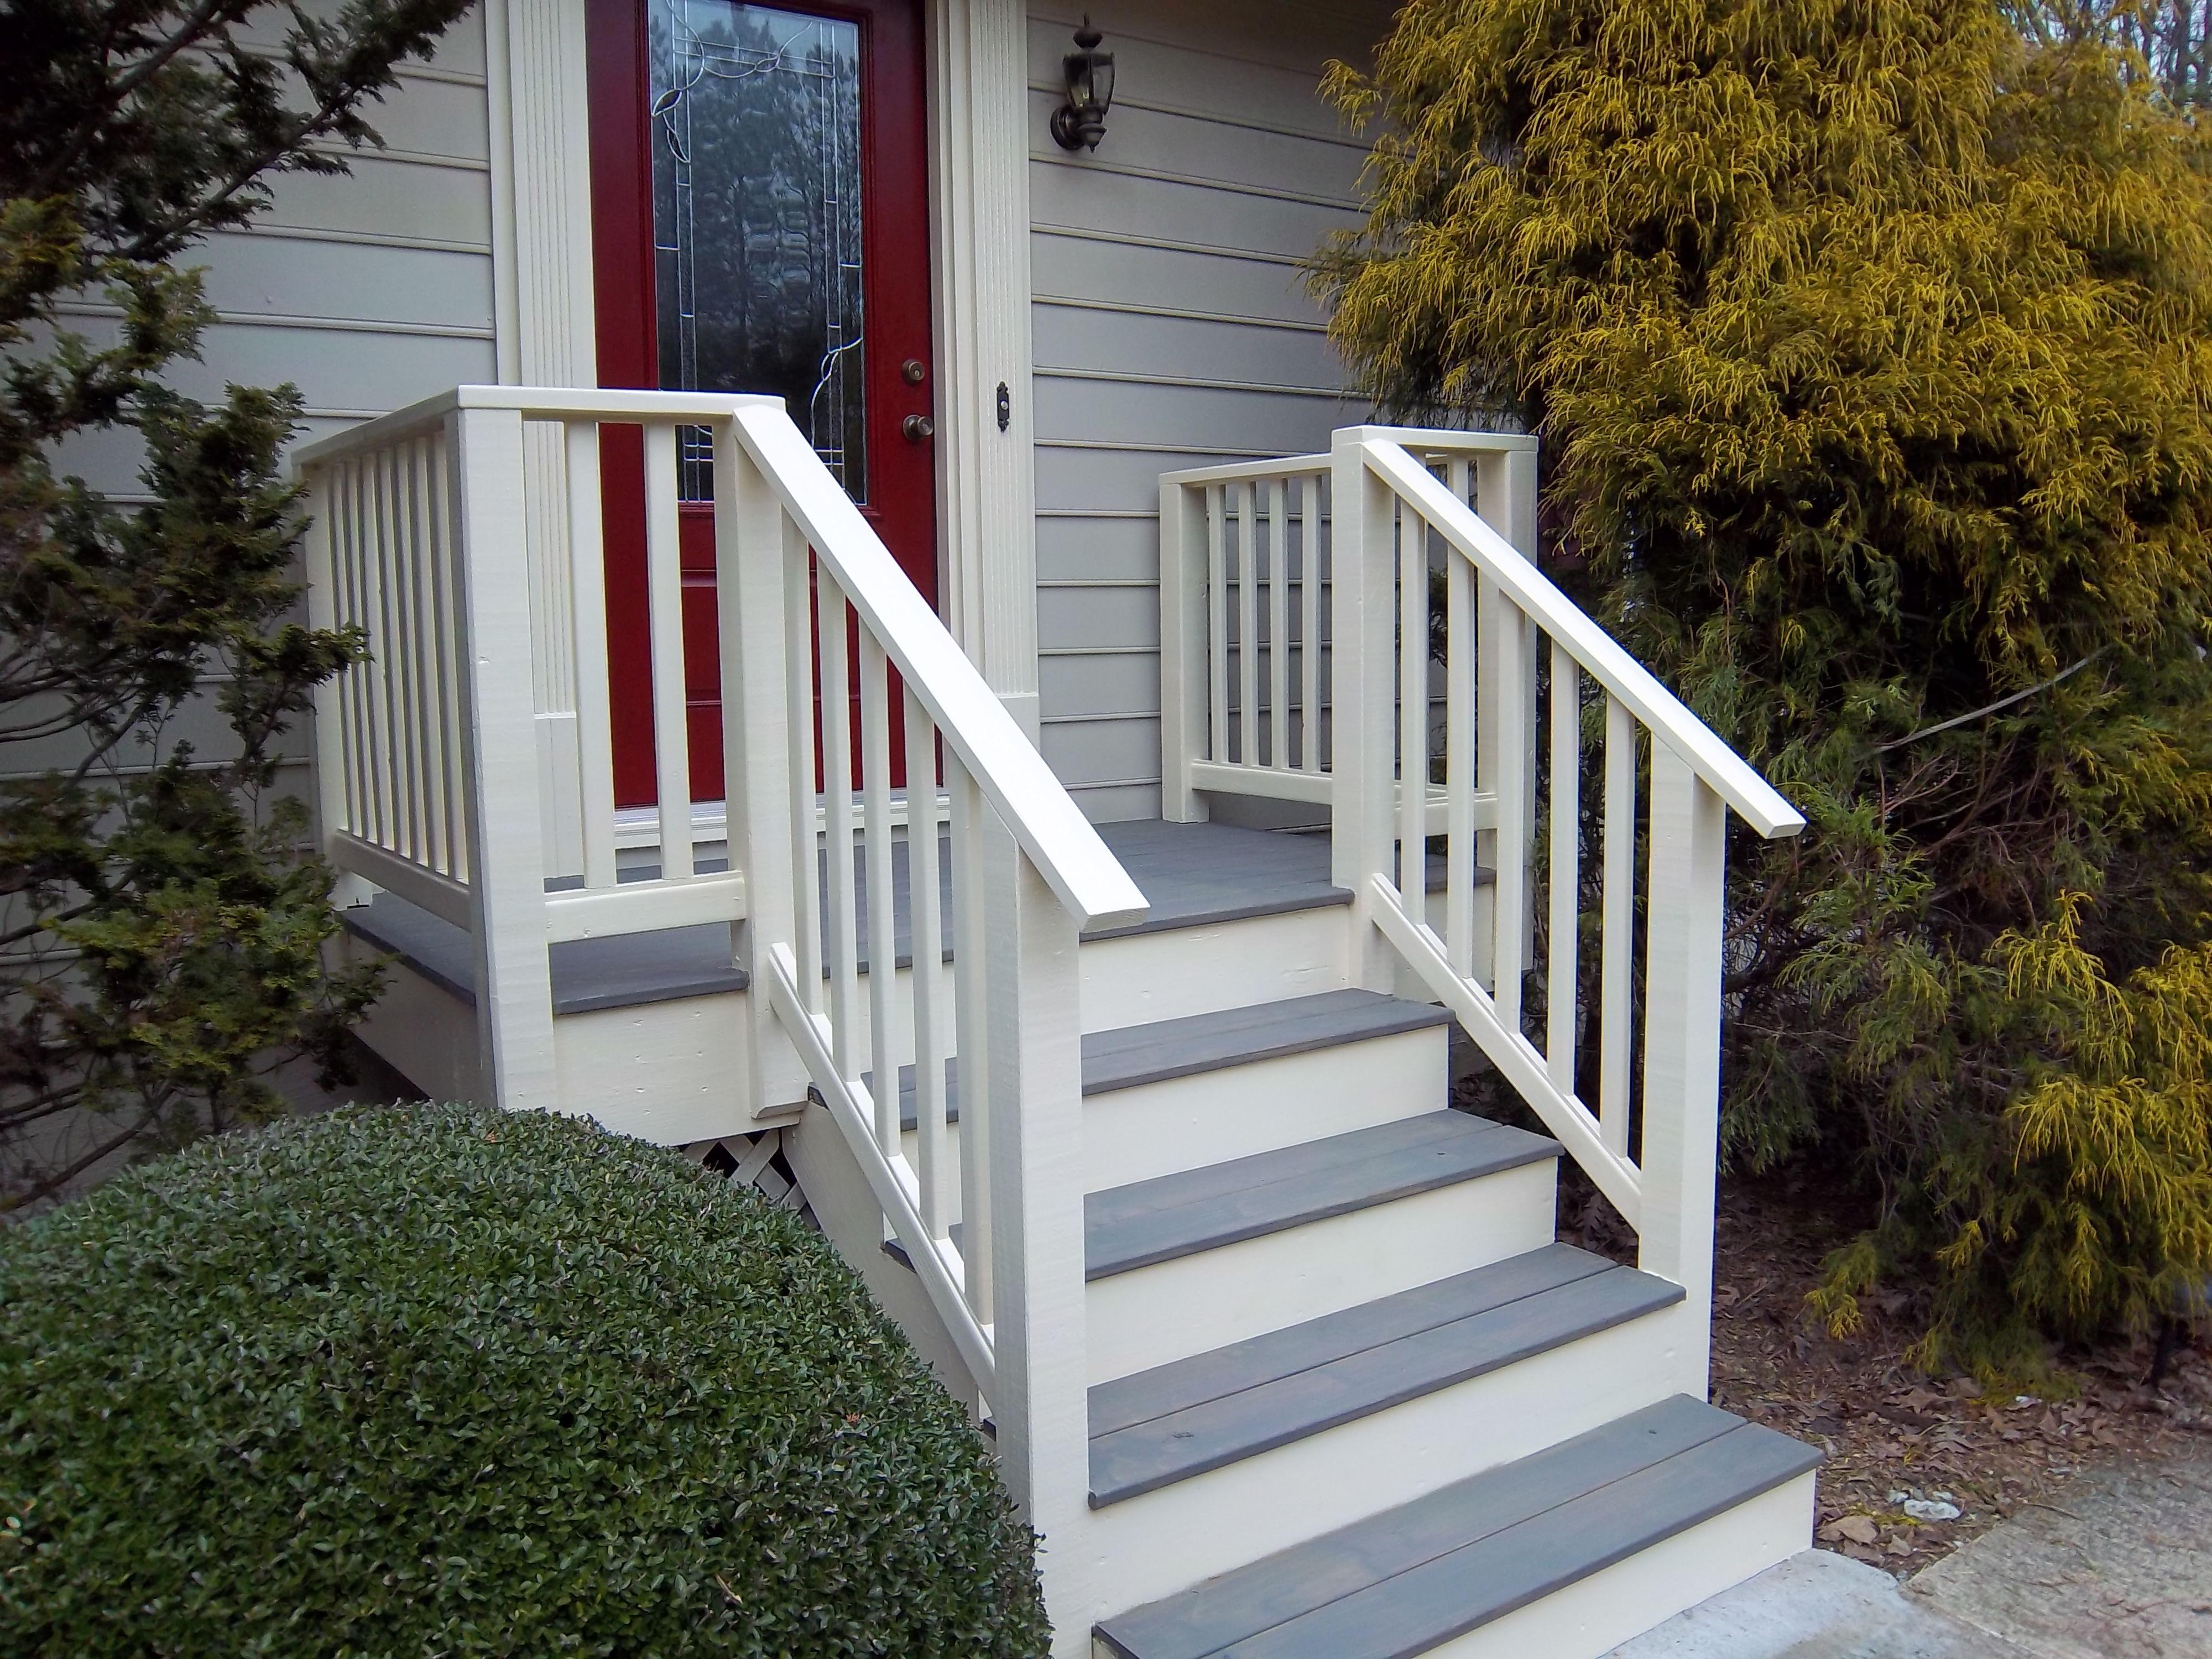 11 Best Deck Over Concrete Stoop Images Deck Over Concrete | Wood Railing On Concrete Steps | Stair Railing | Diy | Wooden | Railing Mode | Staircase